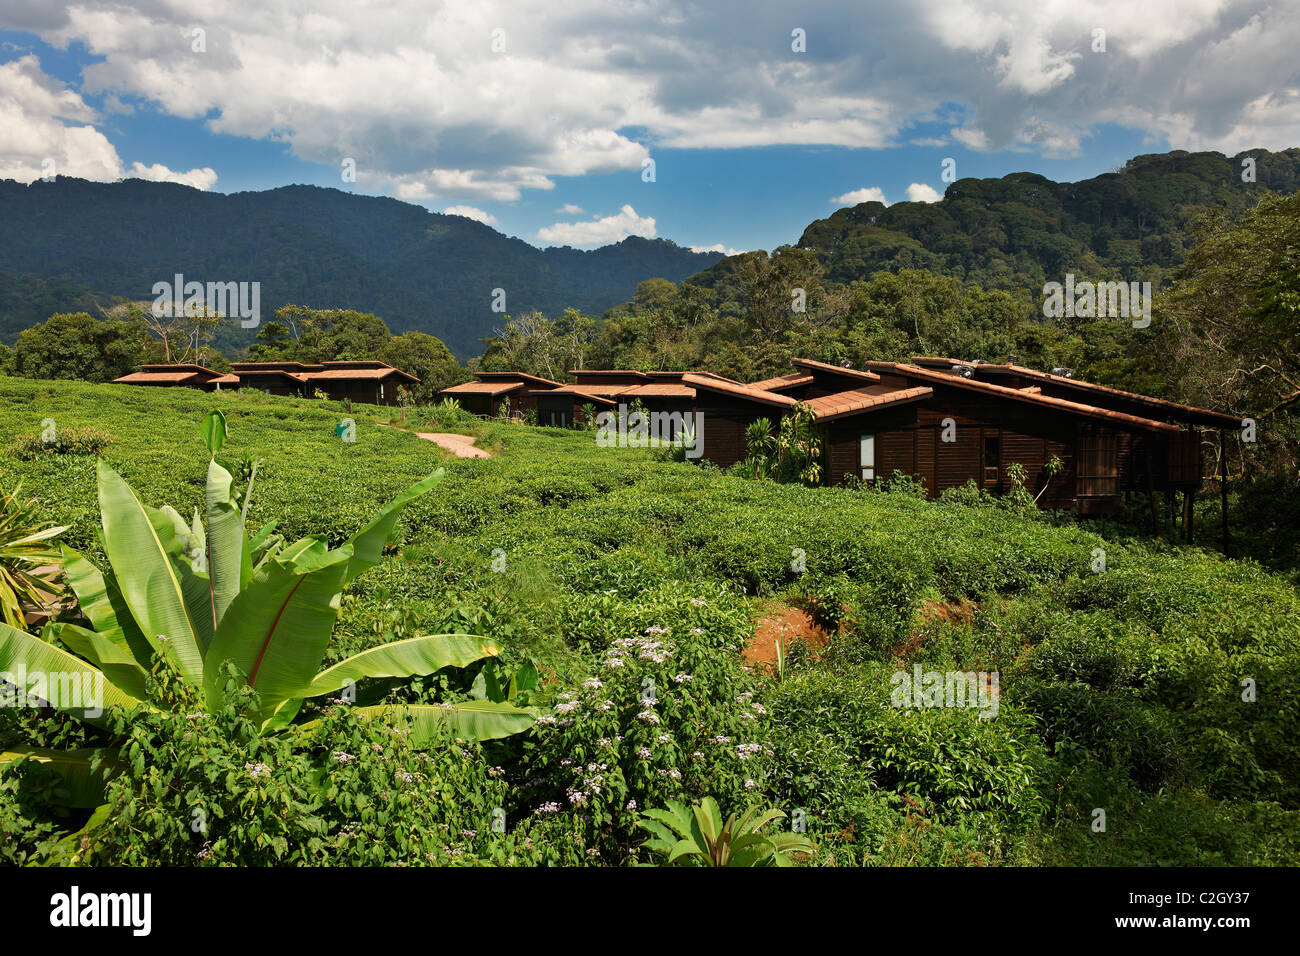 Nyungwe Forest Lodge, Parc National de Nyungwe, Rwanda, Africa - Stock Image